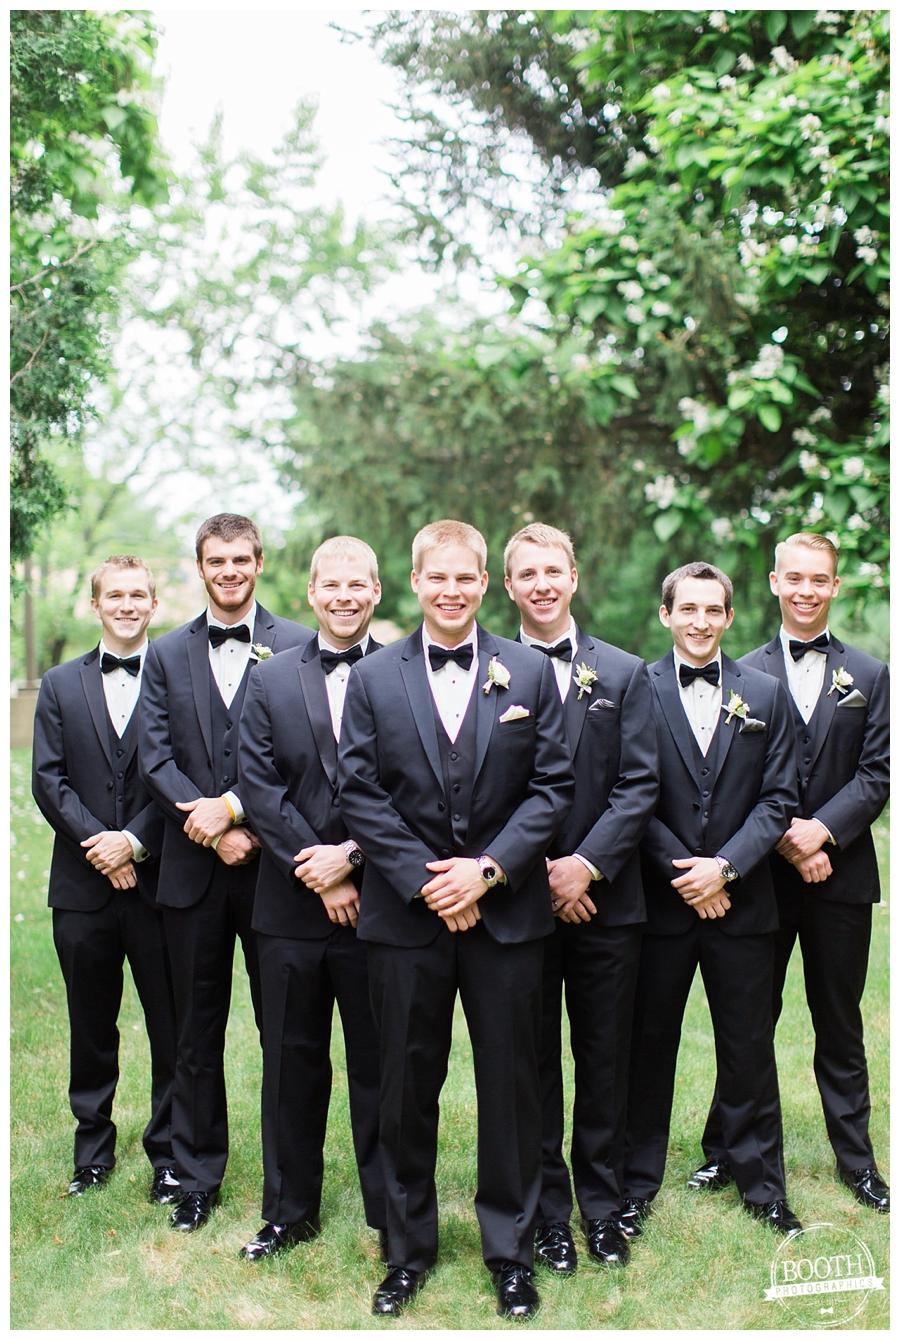 groomsmen together at an elegant UW Madison wedding